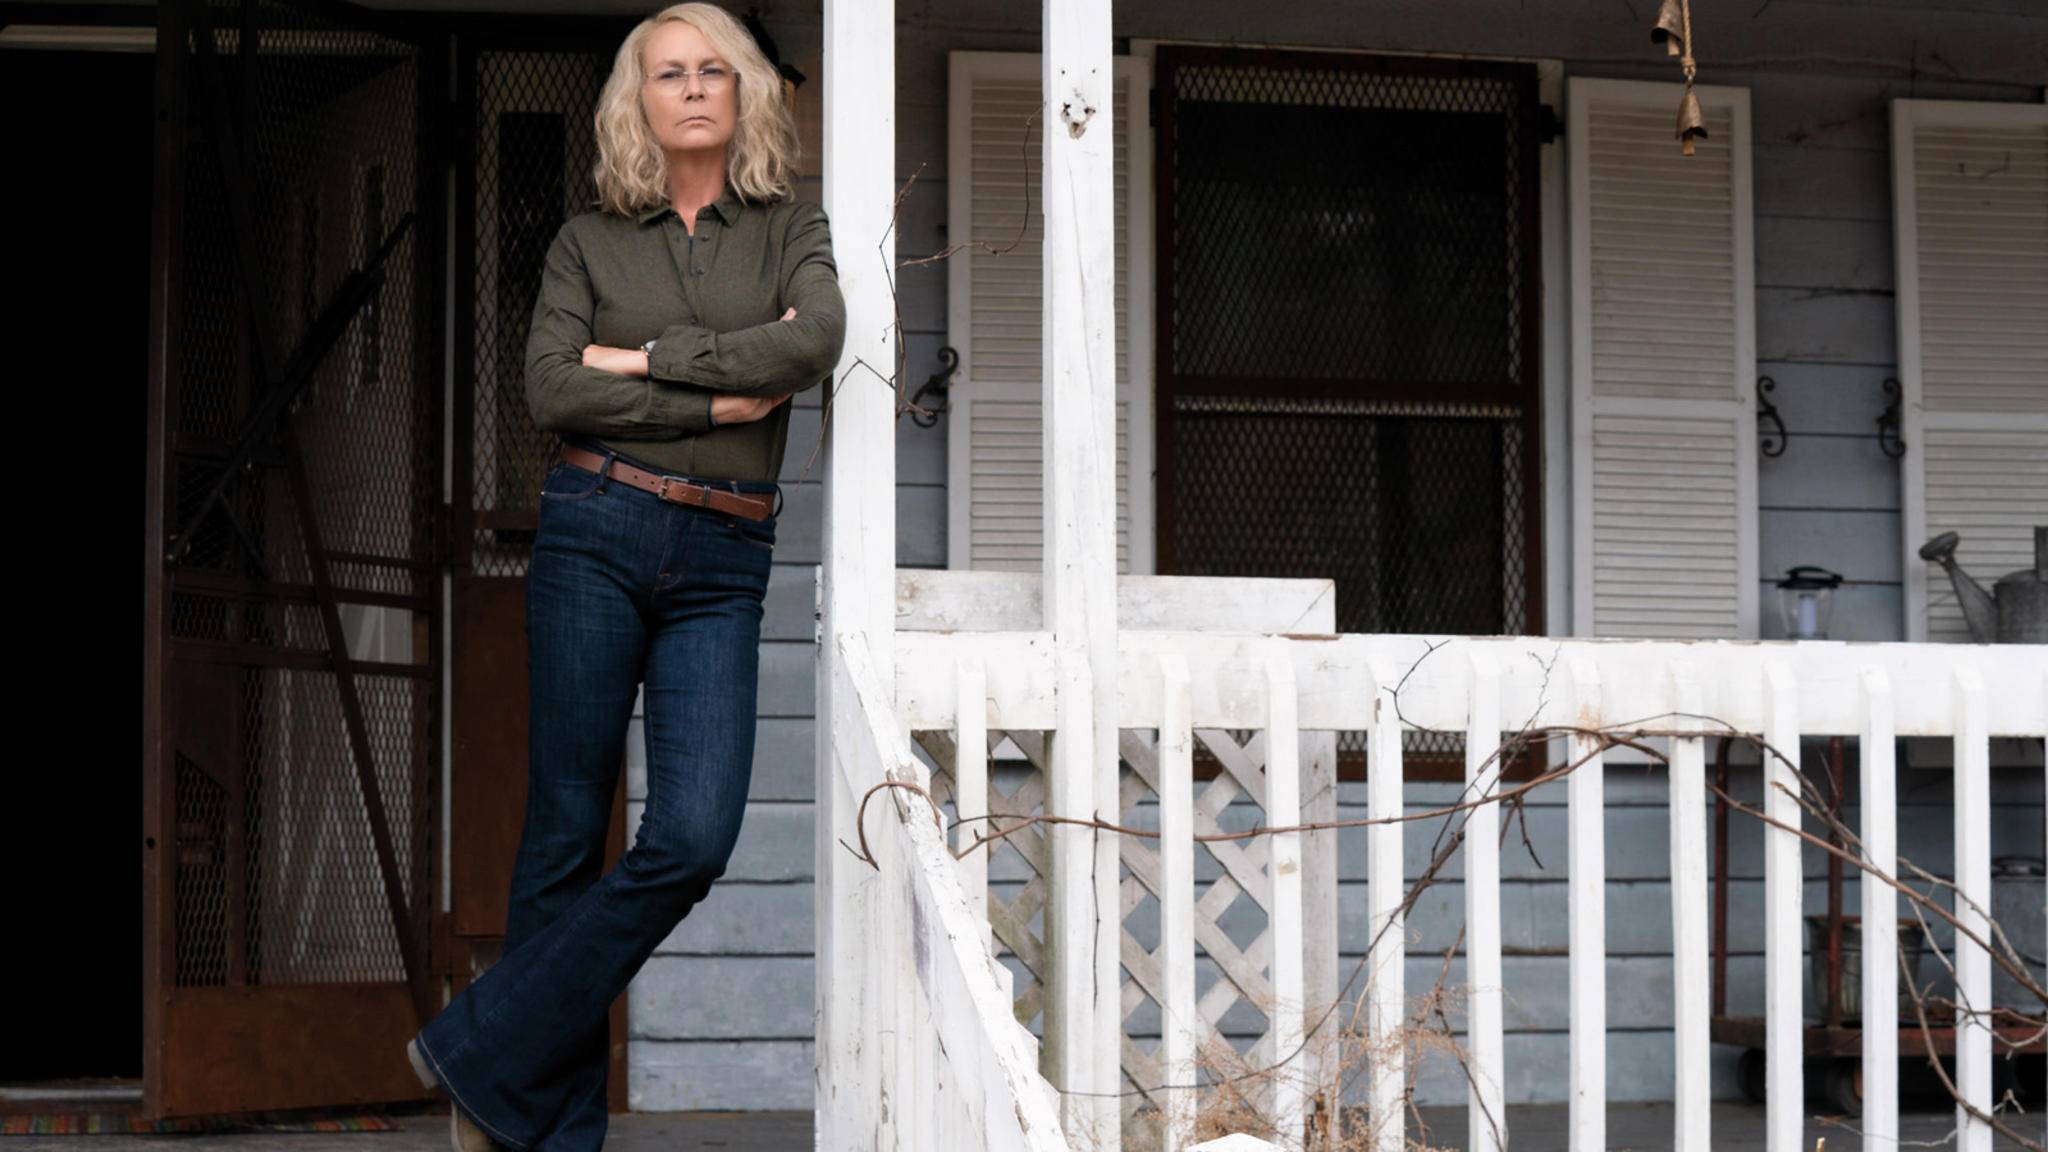 Halloween 2: Blumhouse & Jamie Lee Curtis teasern neues Michael-Myers-Sequel an